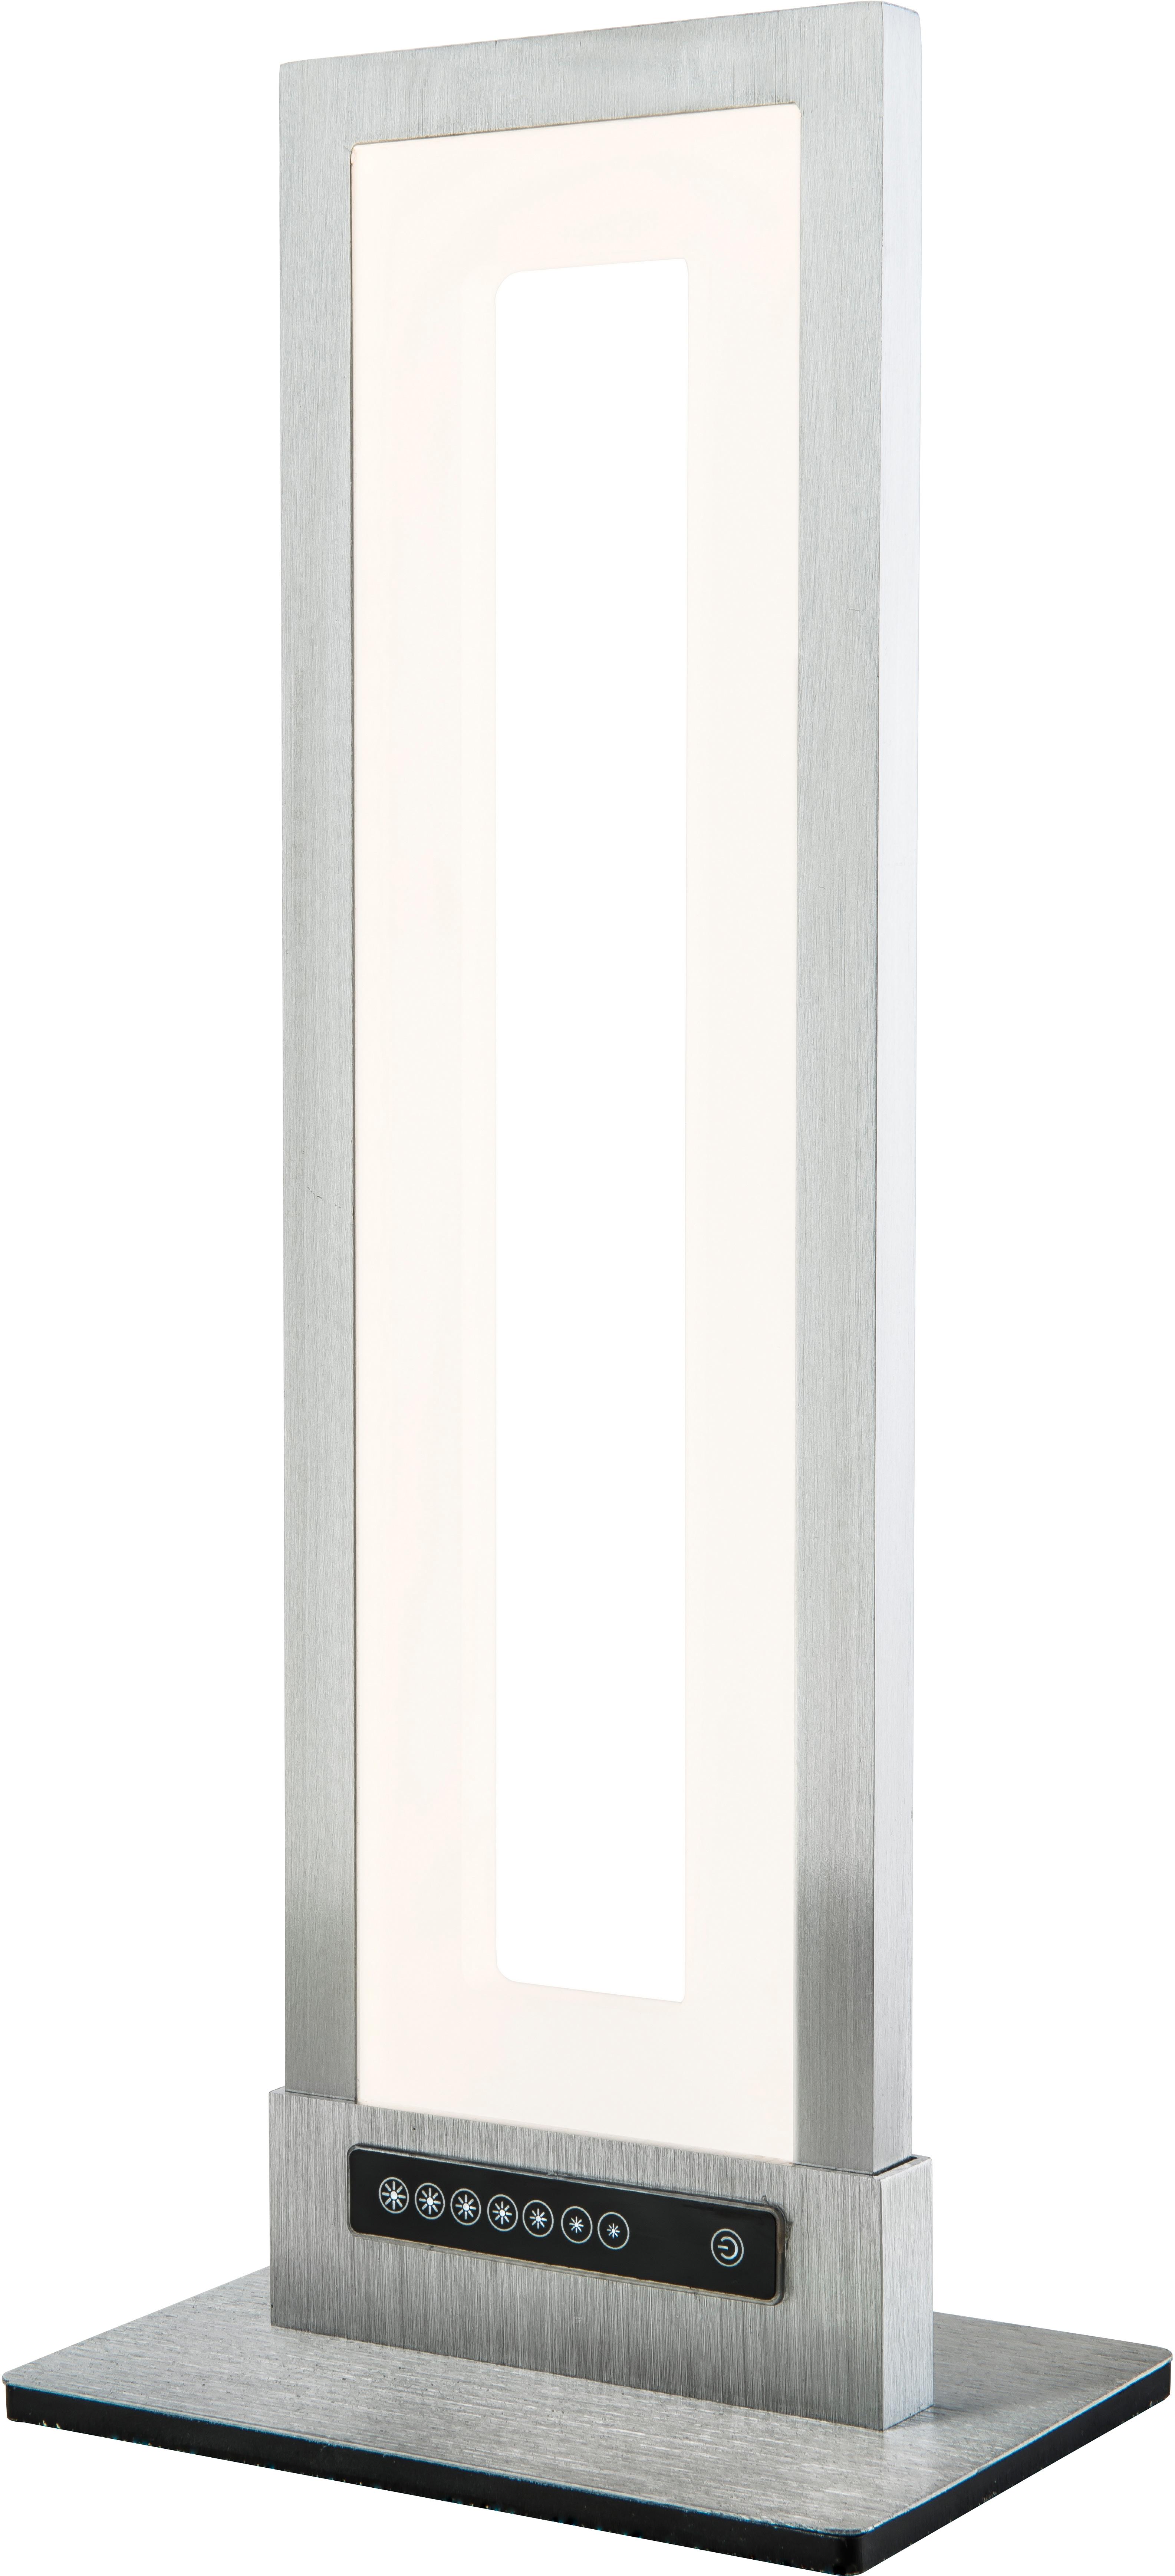 Nino Leuchten LED Tischleuchte JANO